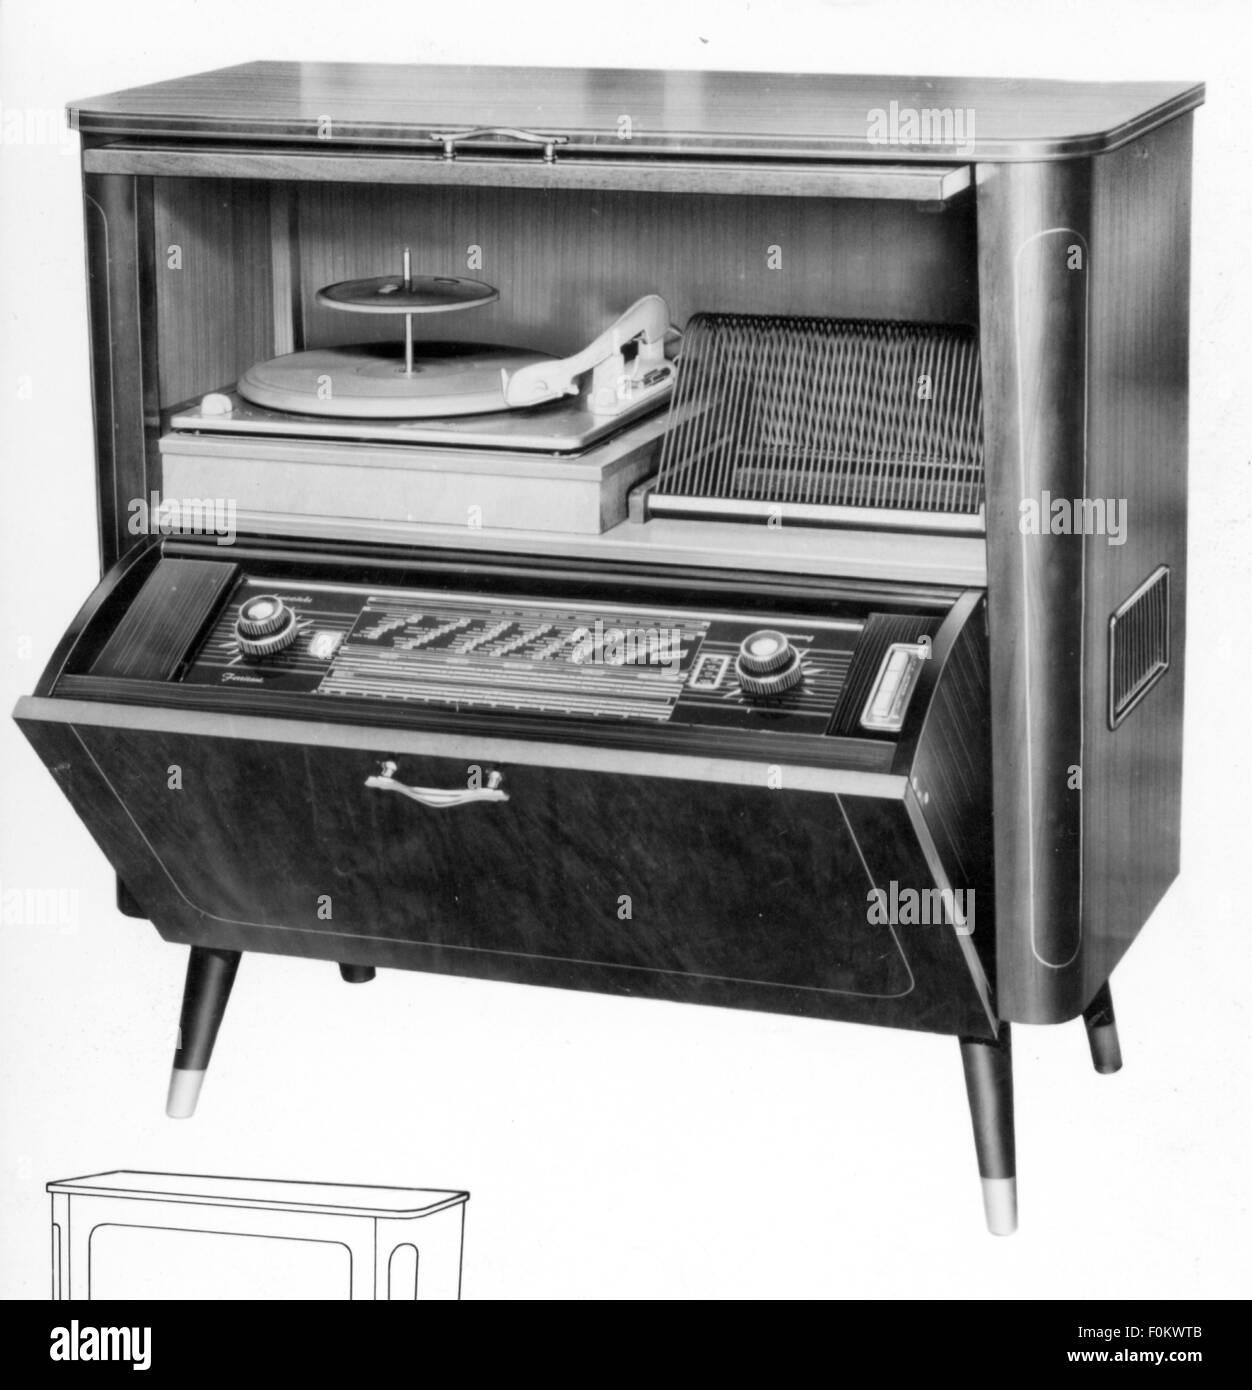 technics, consumer electronics, radiogram W656, Tonfunk GmbH, Karlsruhe, 1956, W 656, W-656, electric appliance, - Stock Image